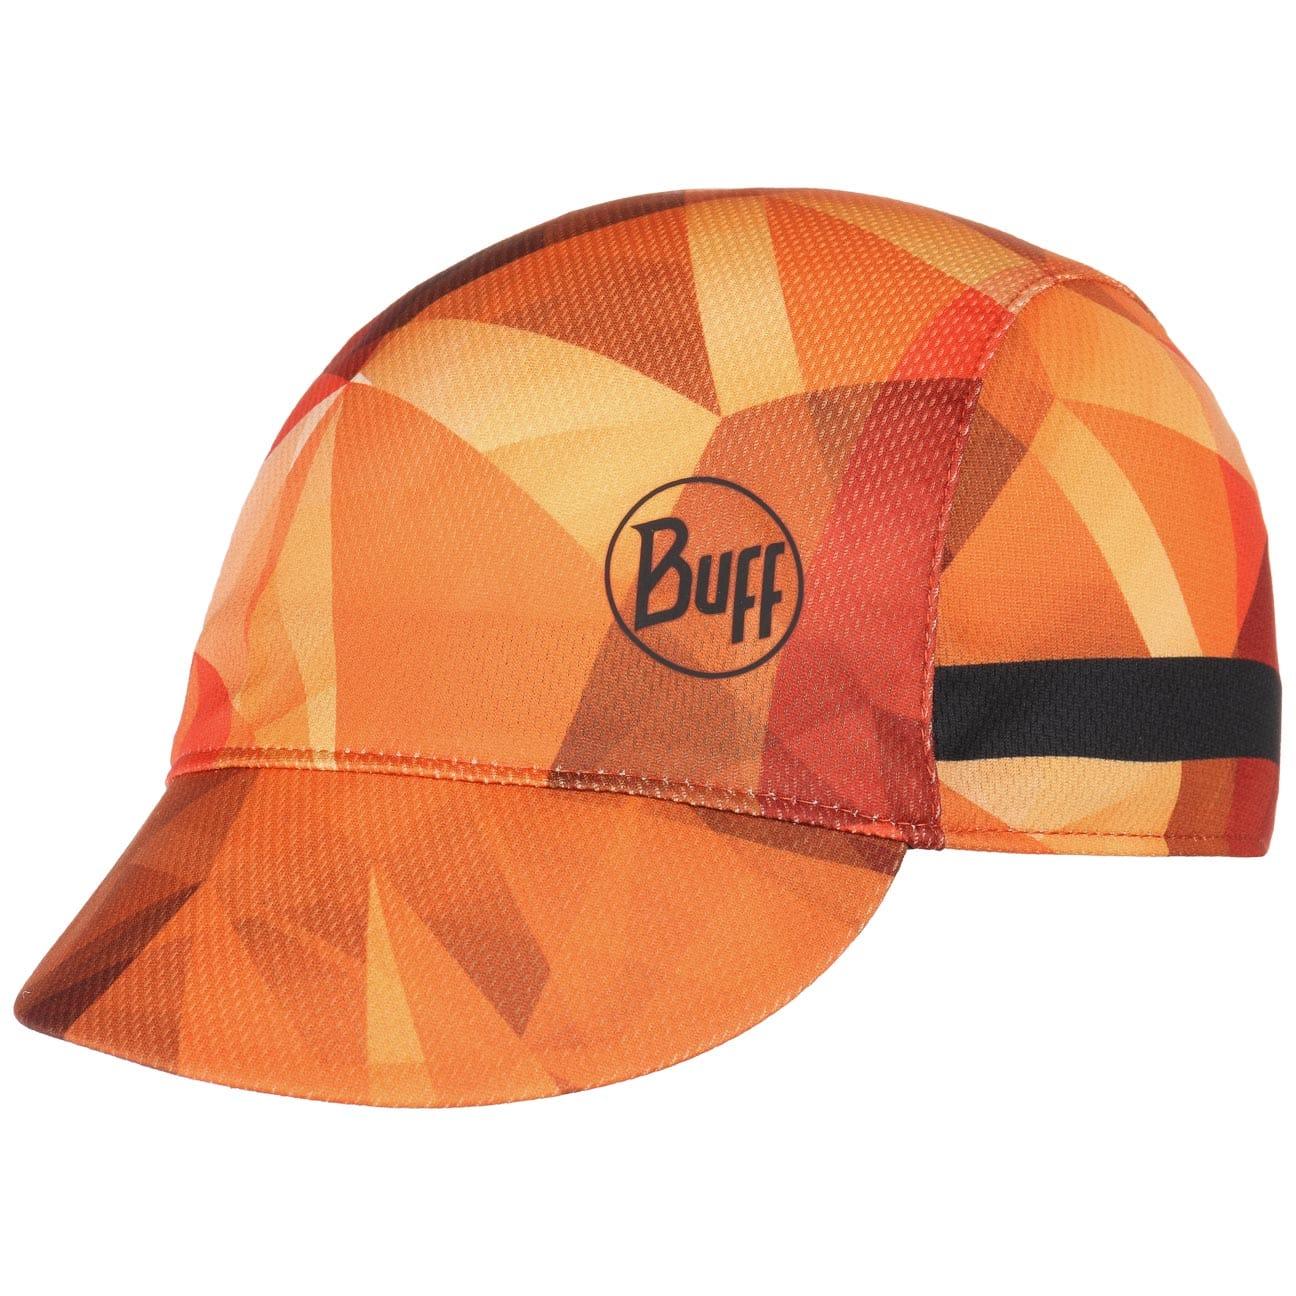 orange-flame-pack-bike-cap-by-buff-basecap